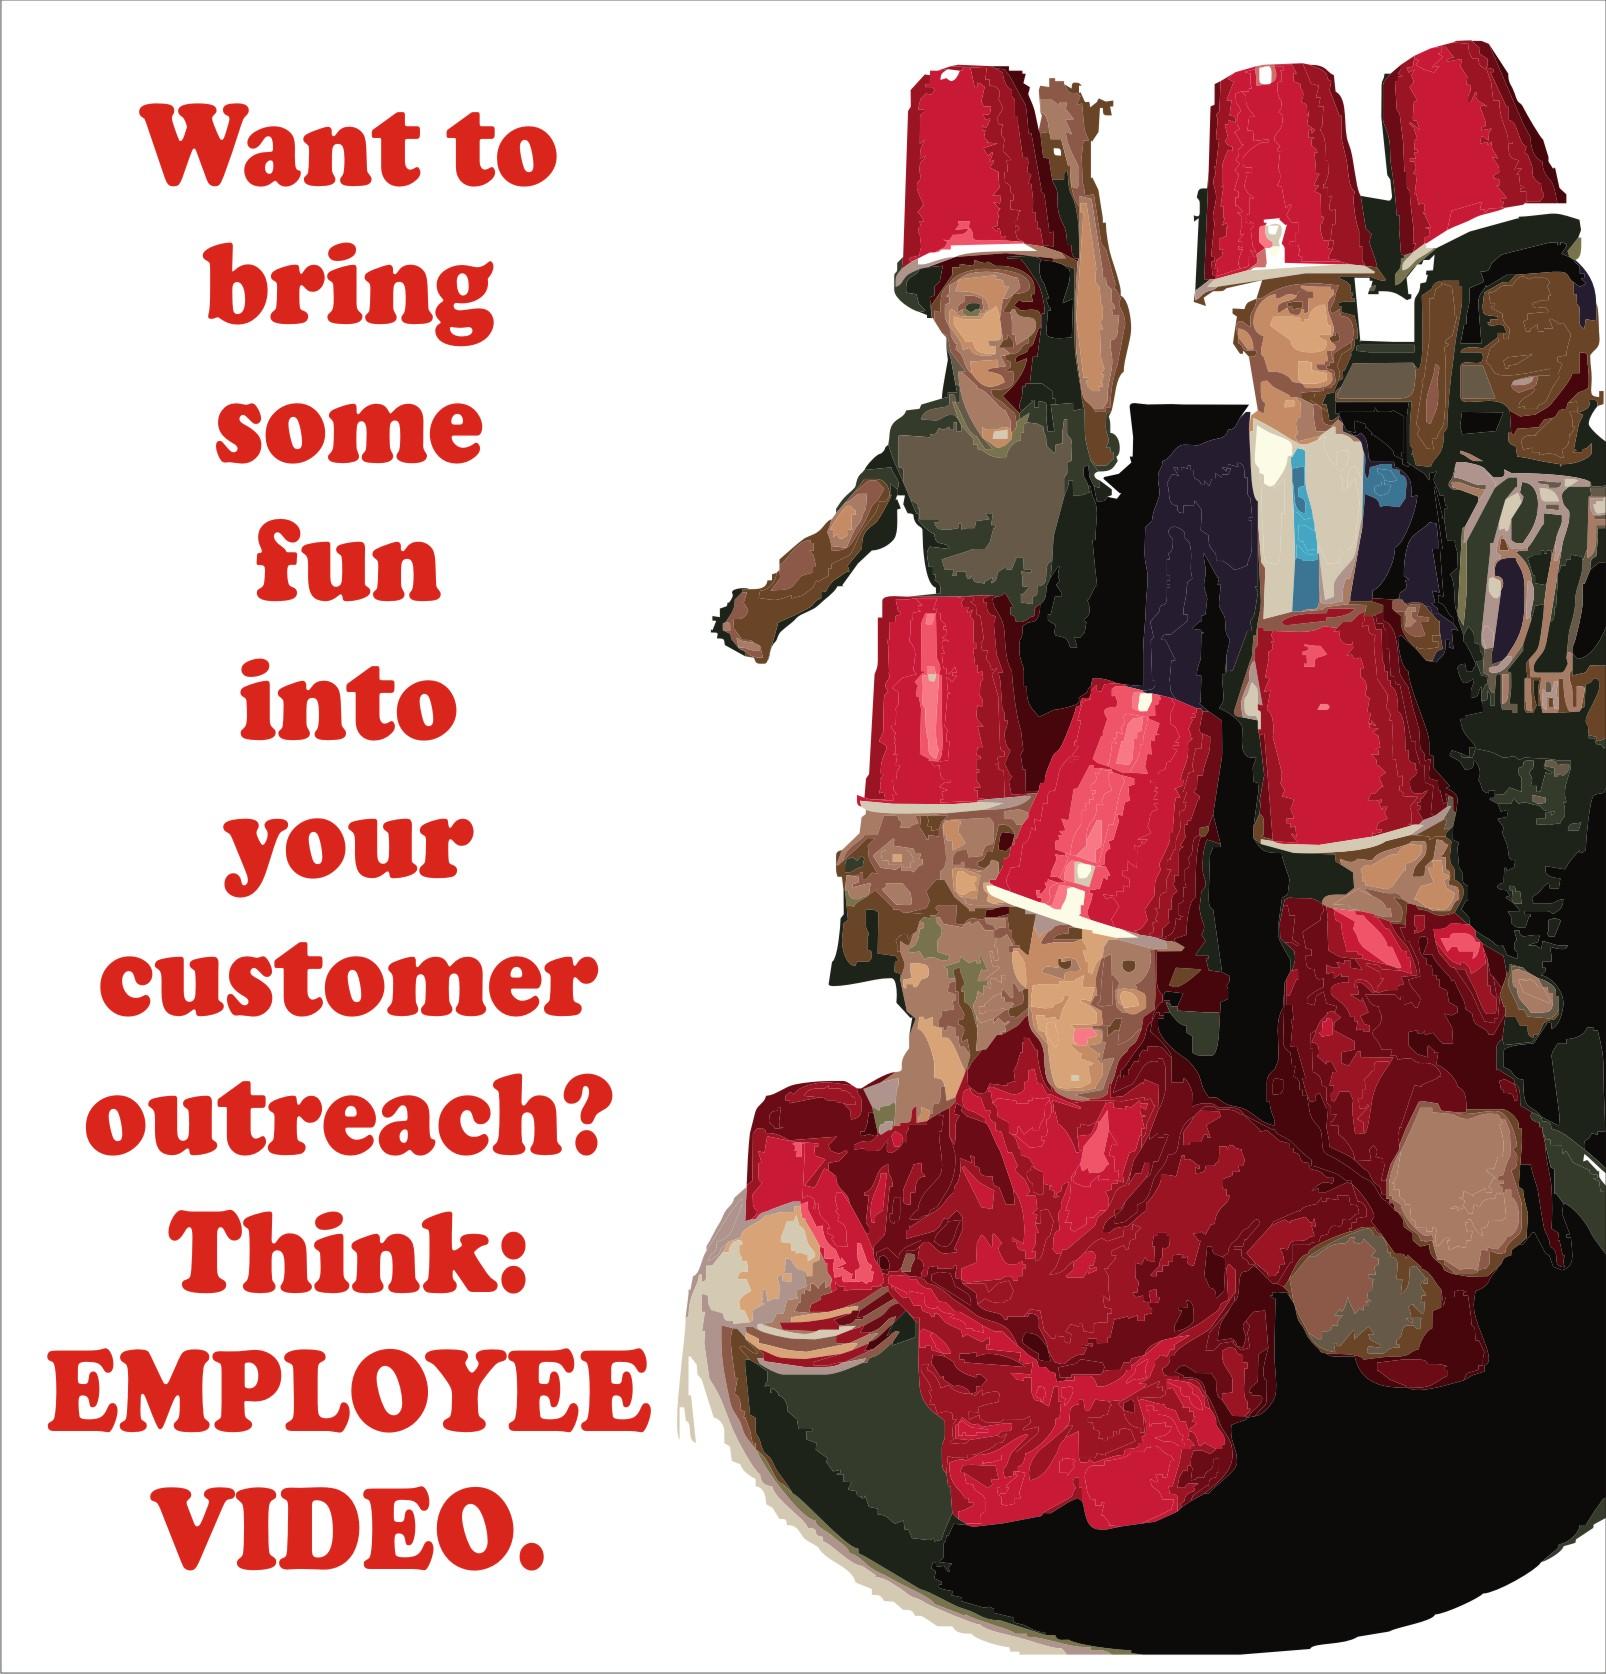 employeevideo